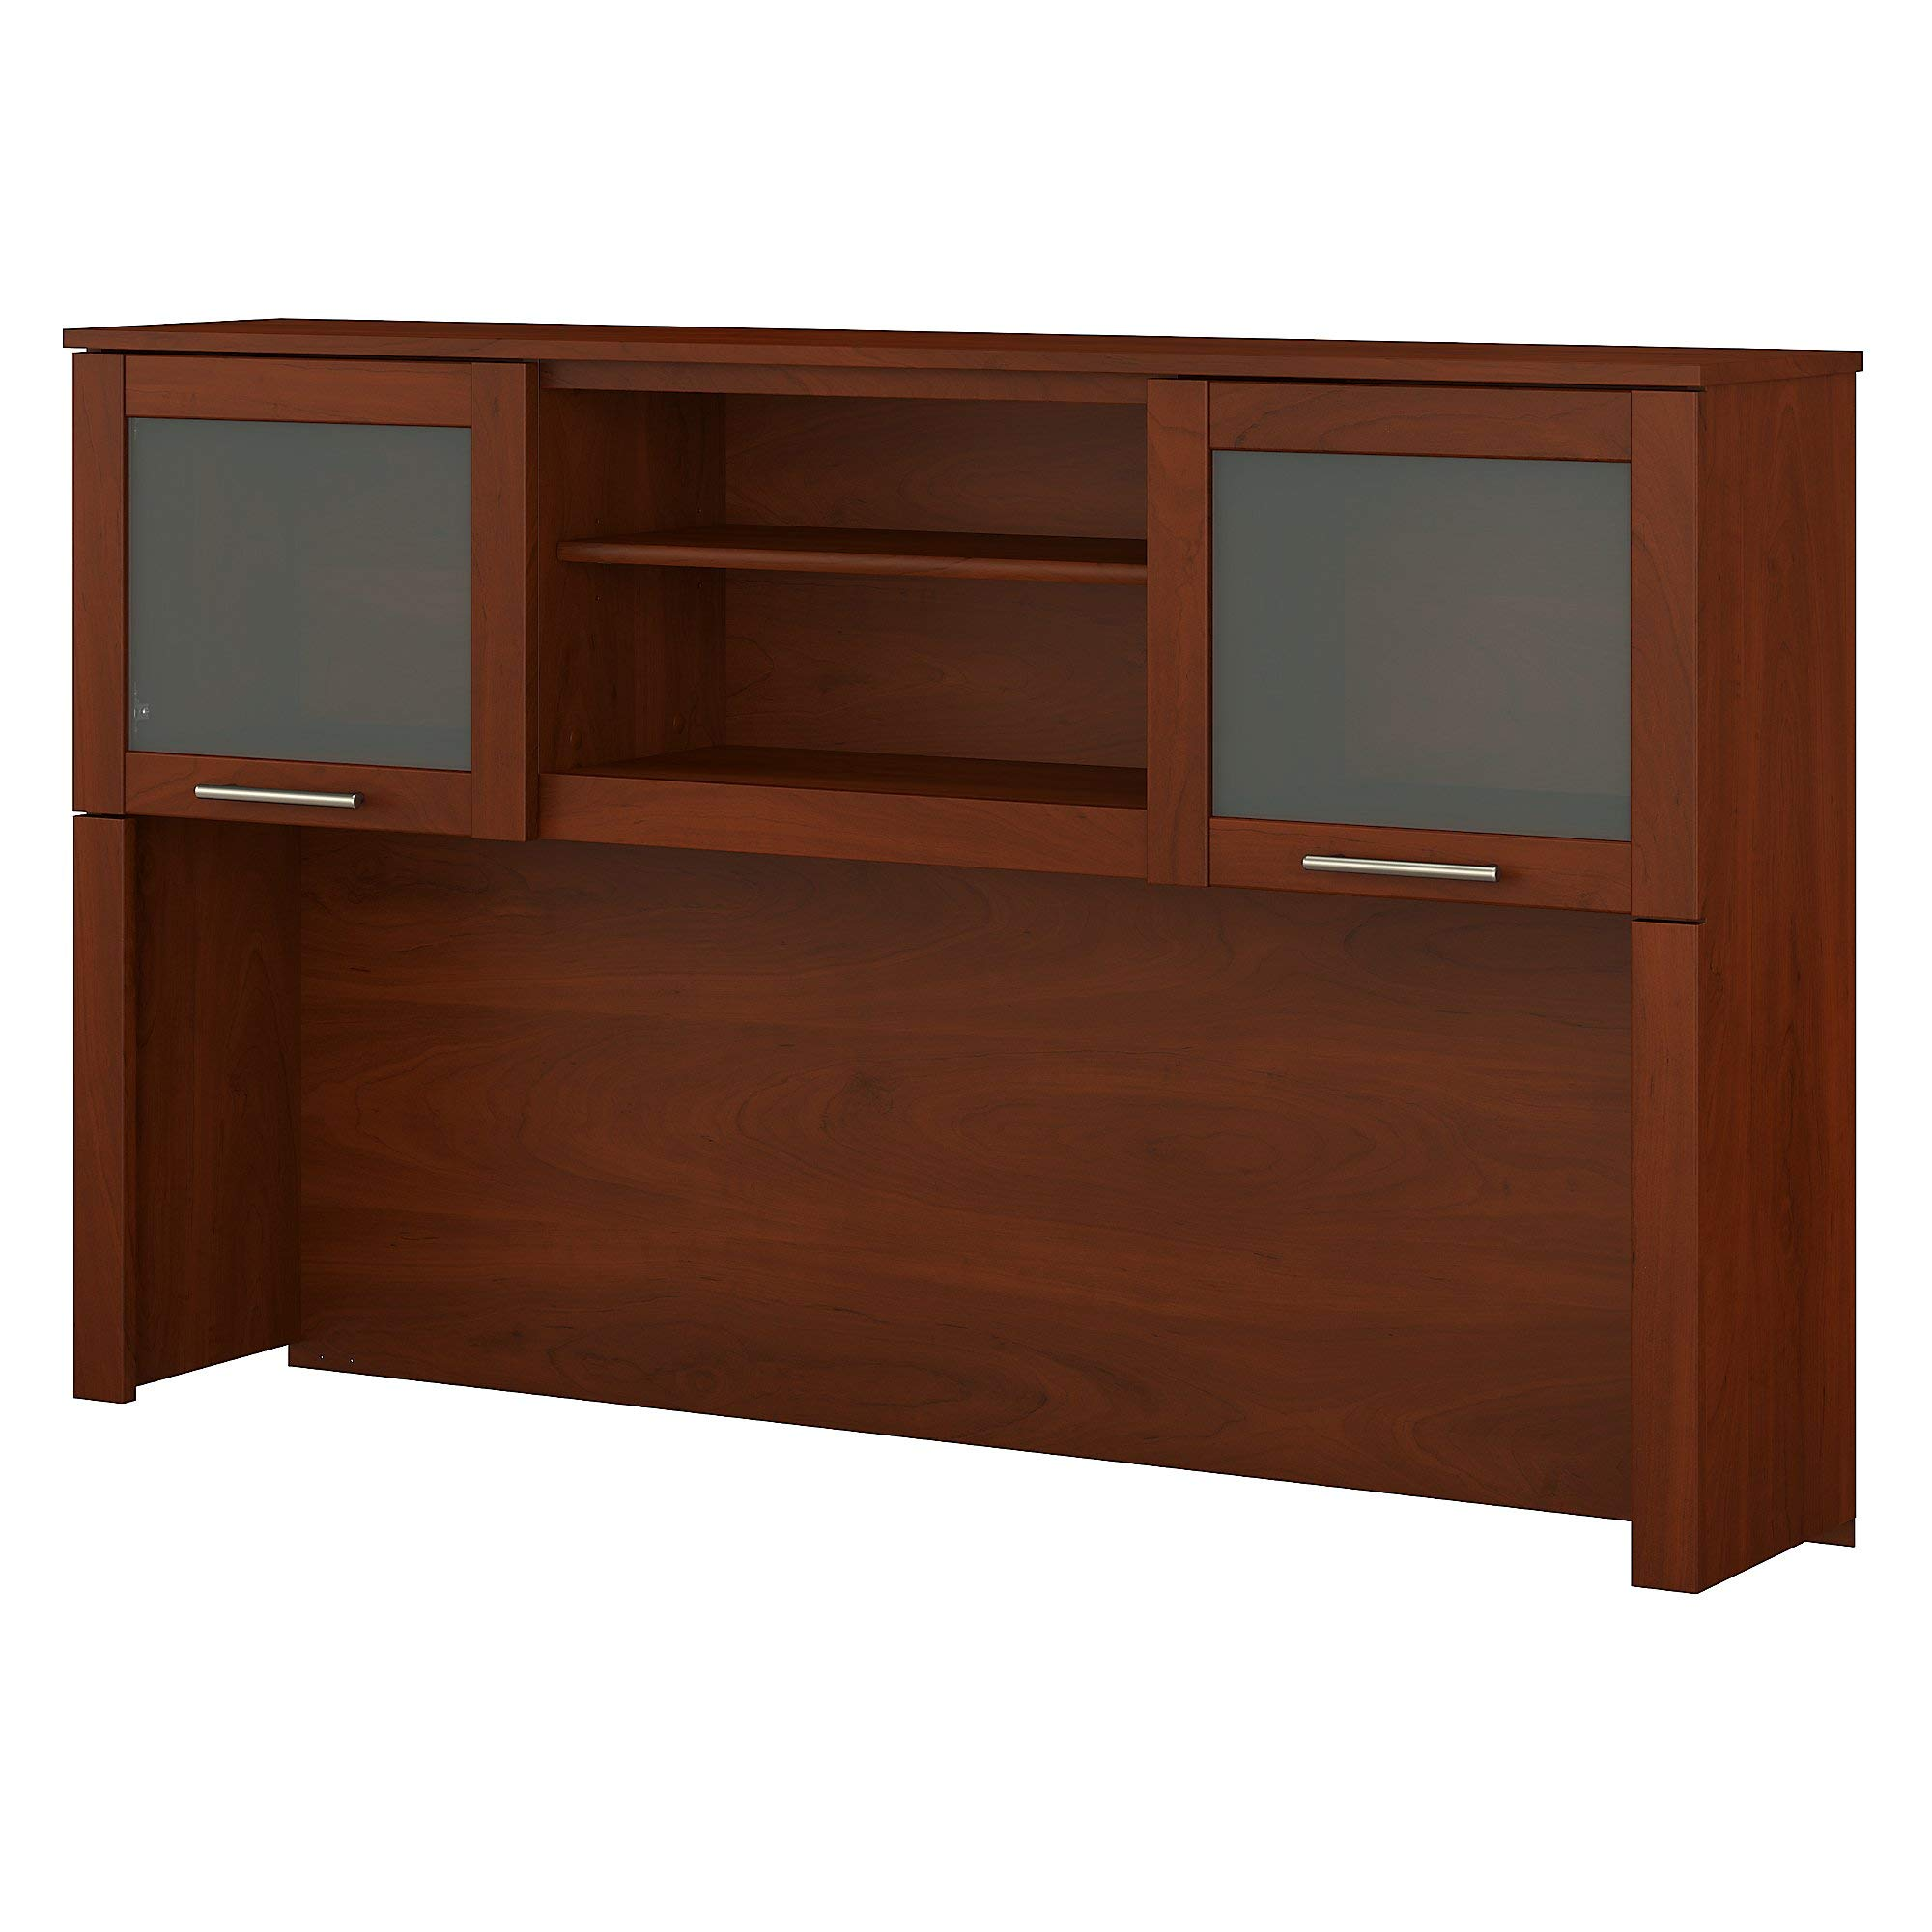 Bush Furniture Somerset 60W Hutch for L Shaped Desk in Hansen Cherry by Bush Furniture